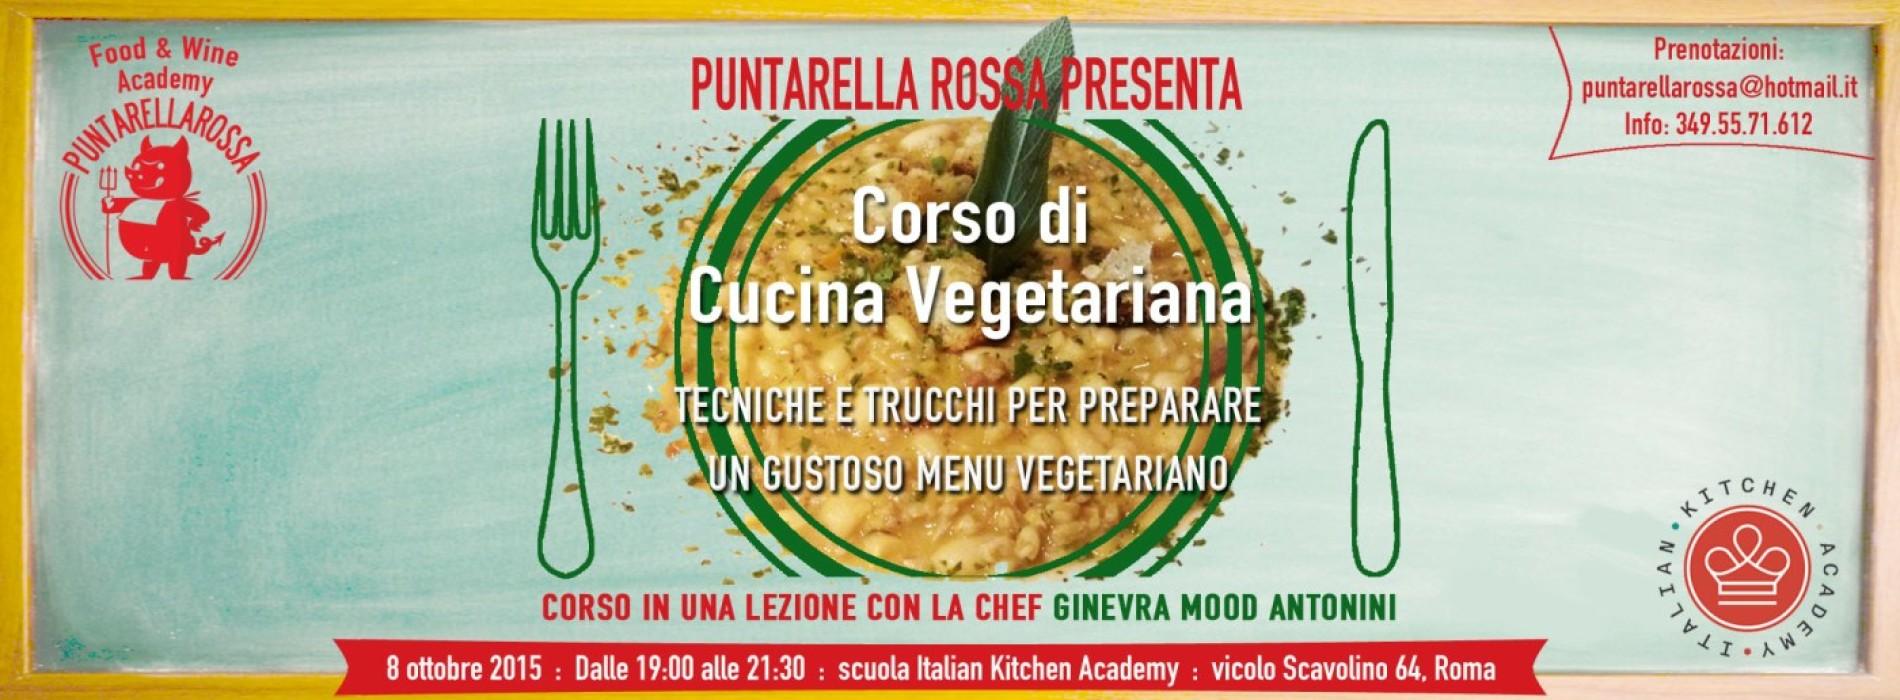 corso cucina vegetariana roma puntarella - Cucina Vegana Roma